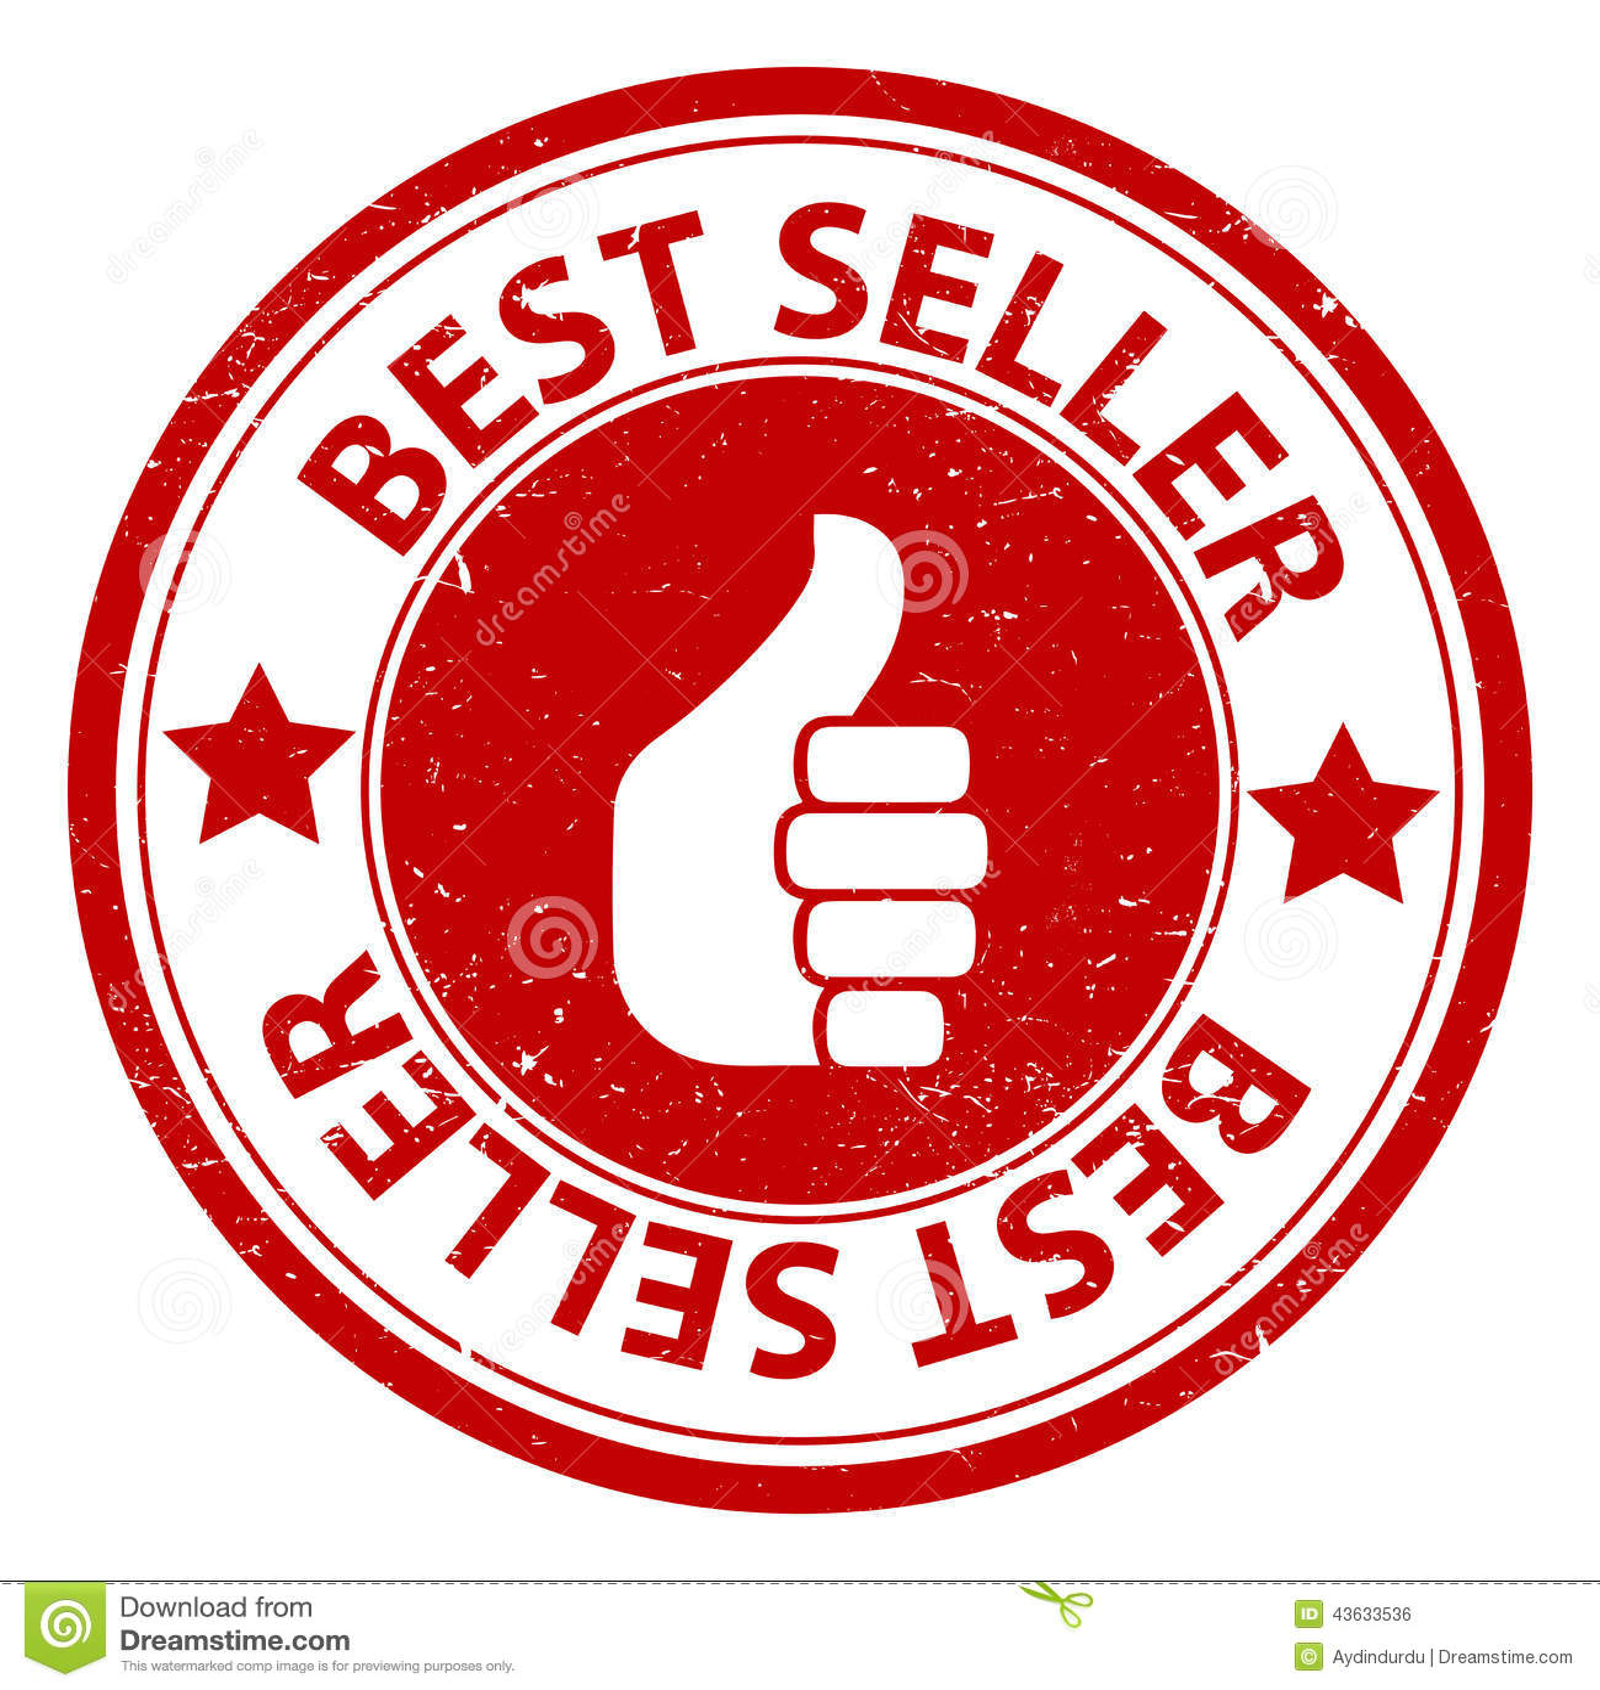 Best Seller Stock Vector. Illustration Of Design, Thumbs